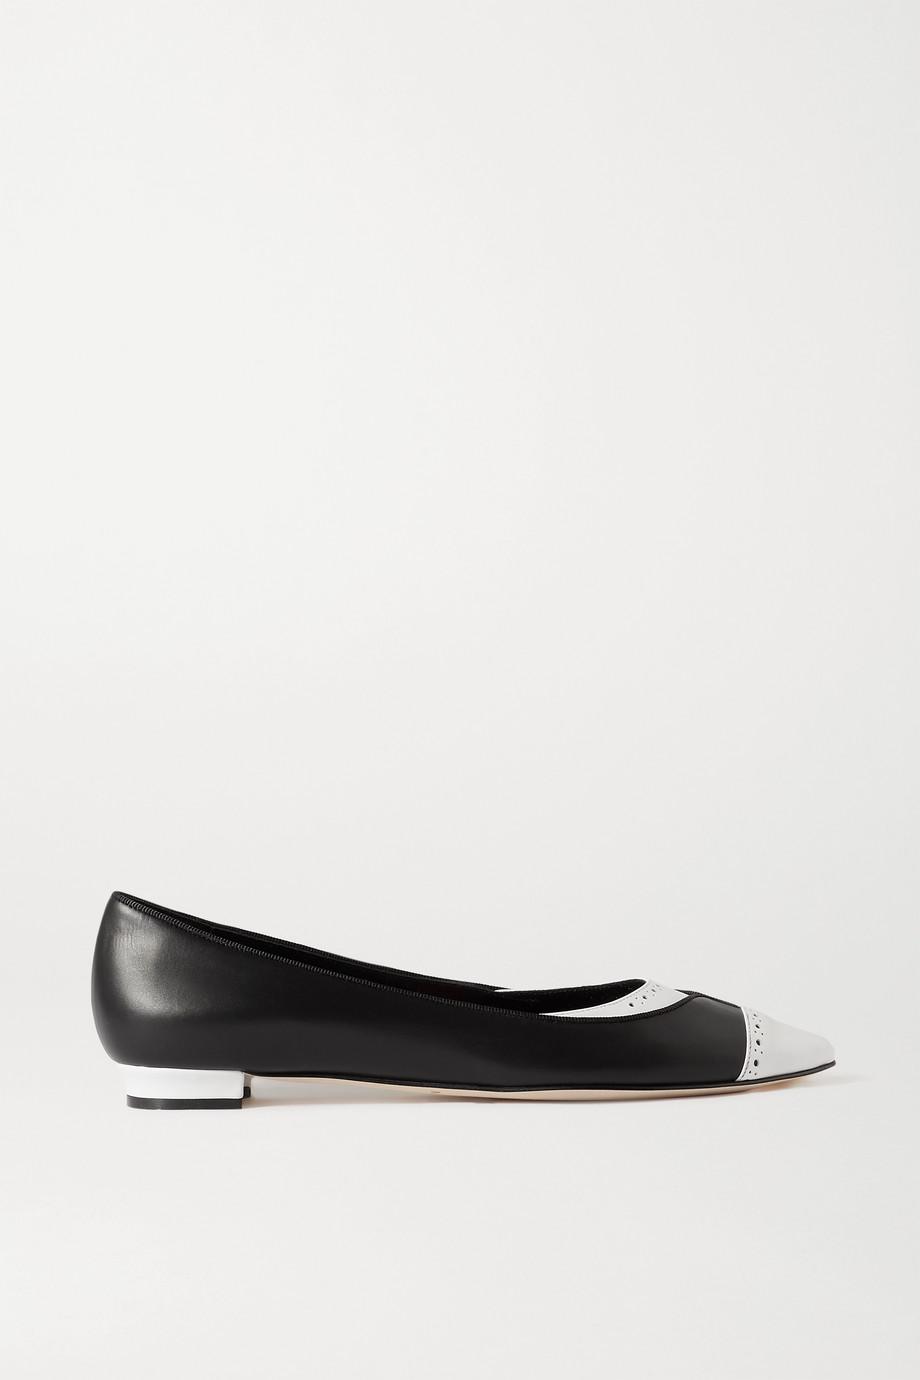 Manolo Blahnik Anfiliga two-tone leather point-toe flats